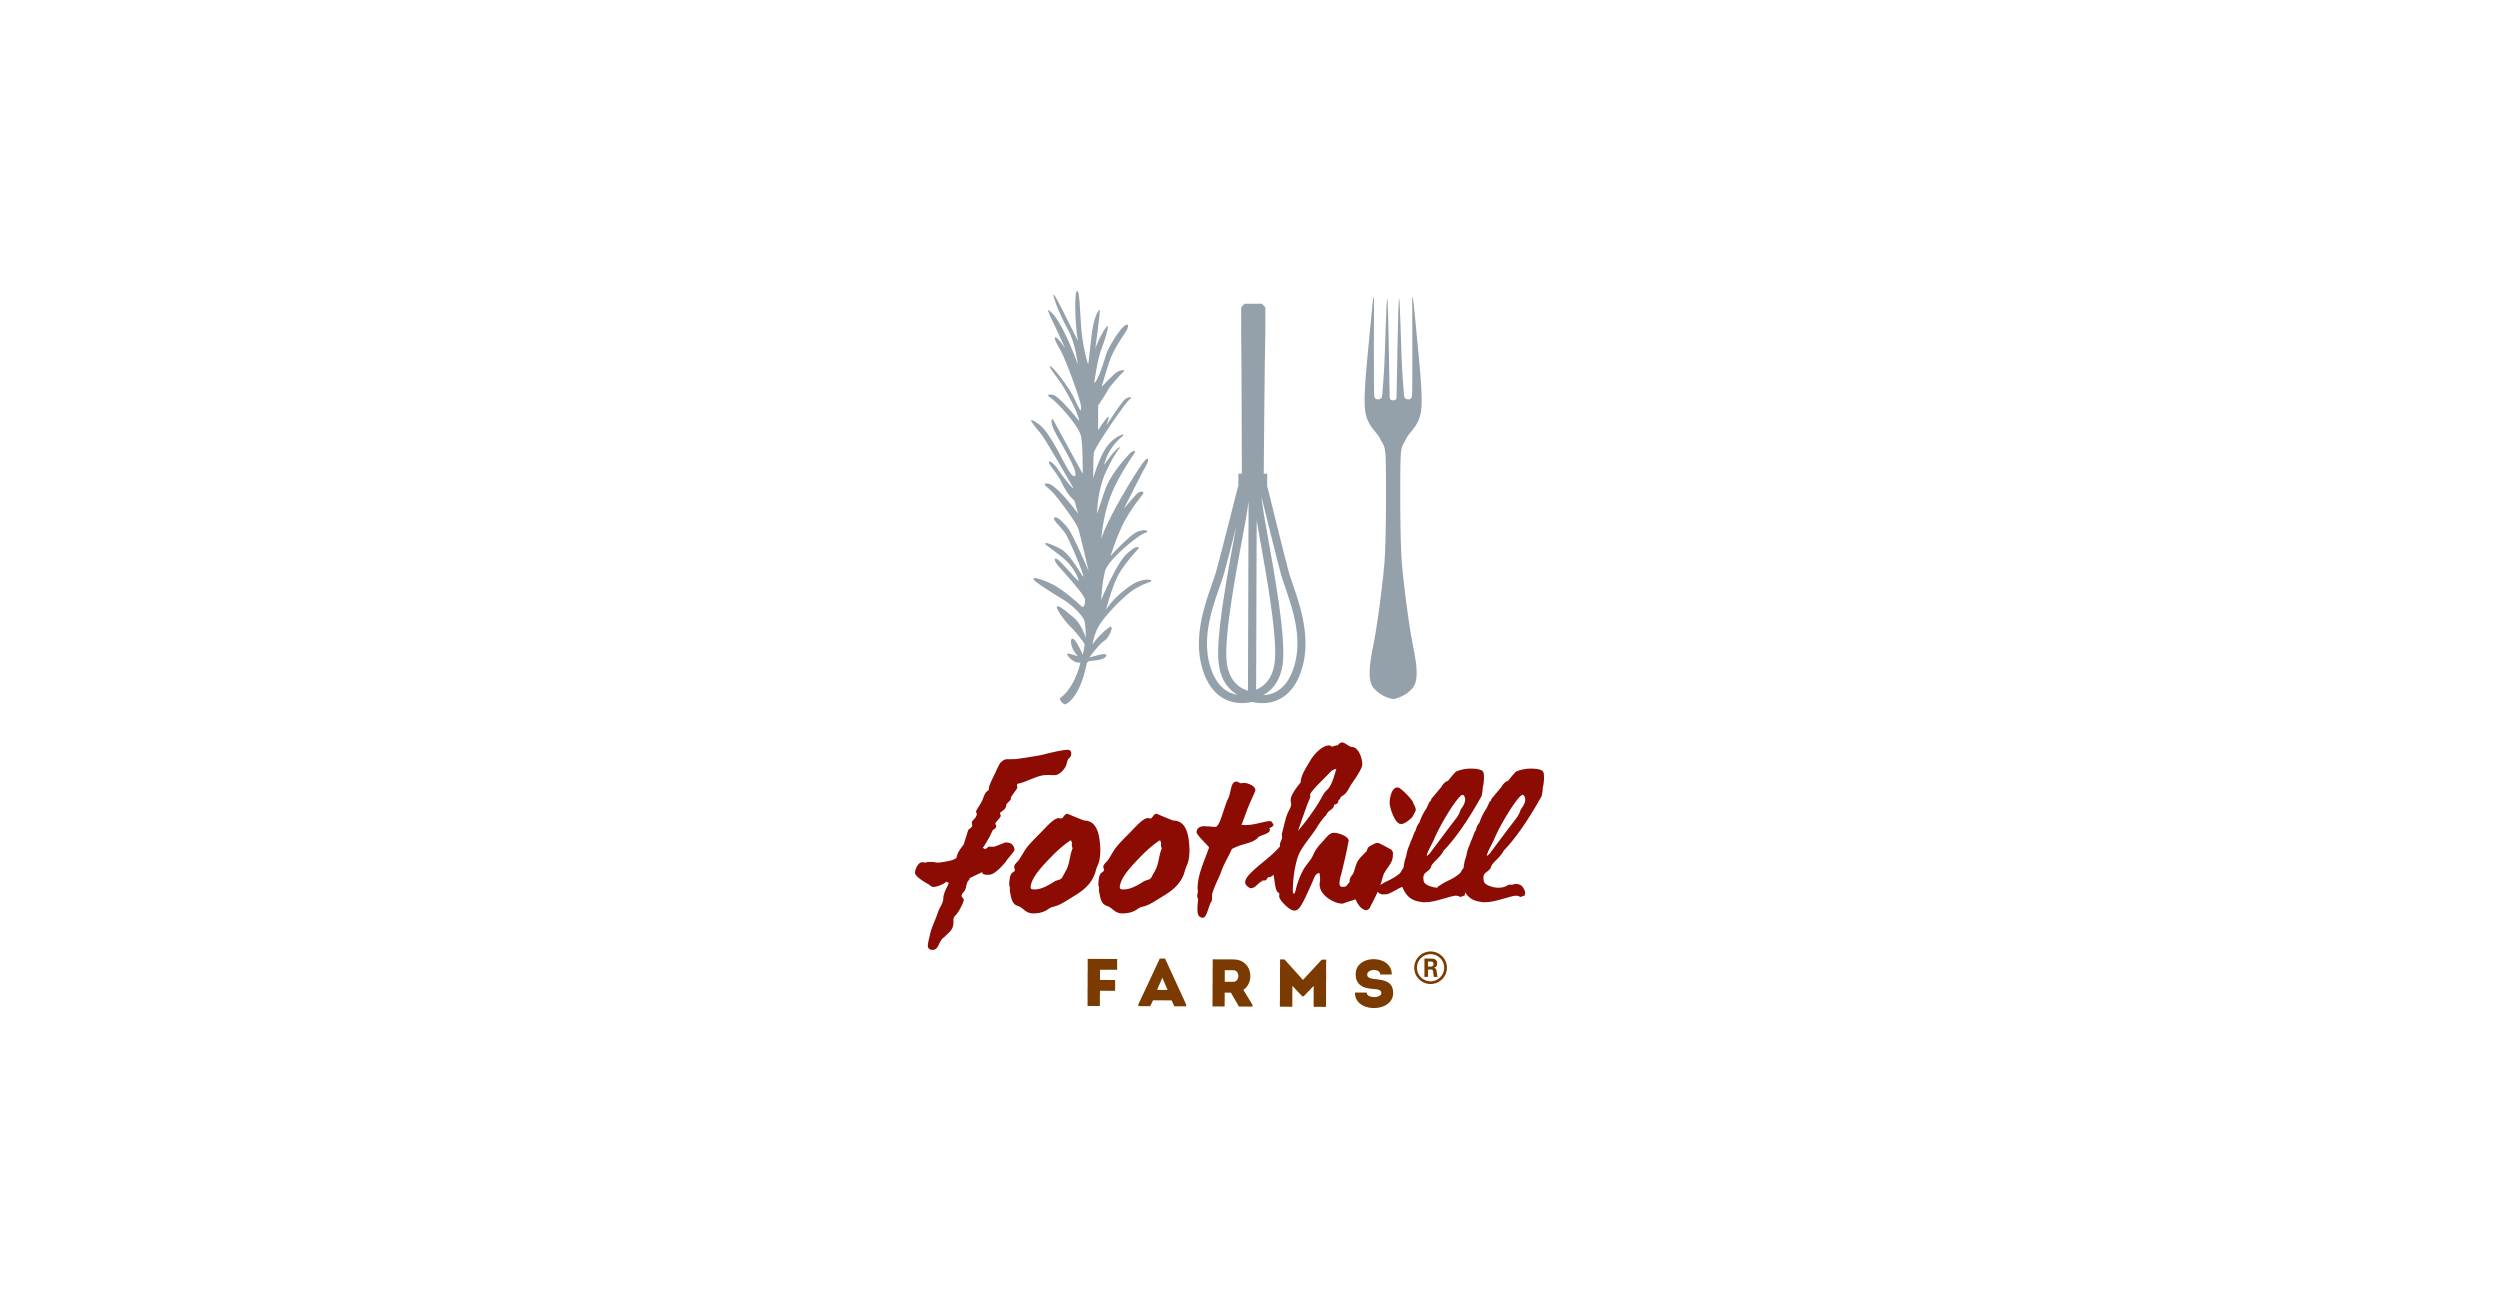 foothillfarms_logo-2.png